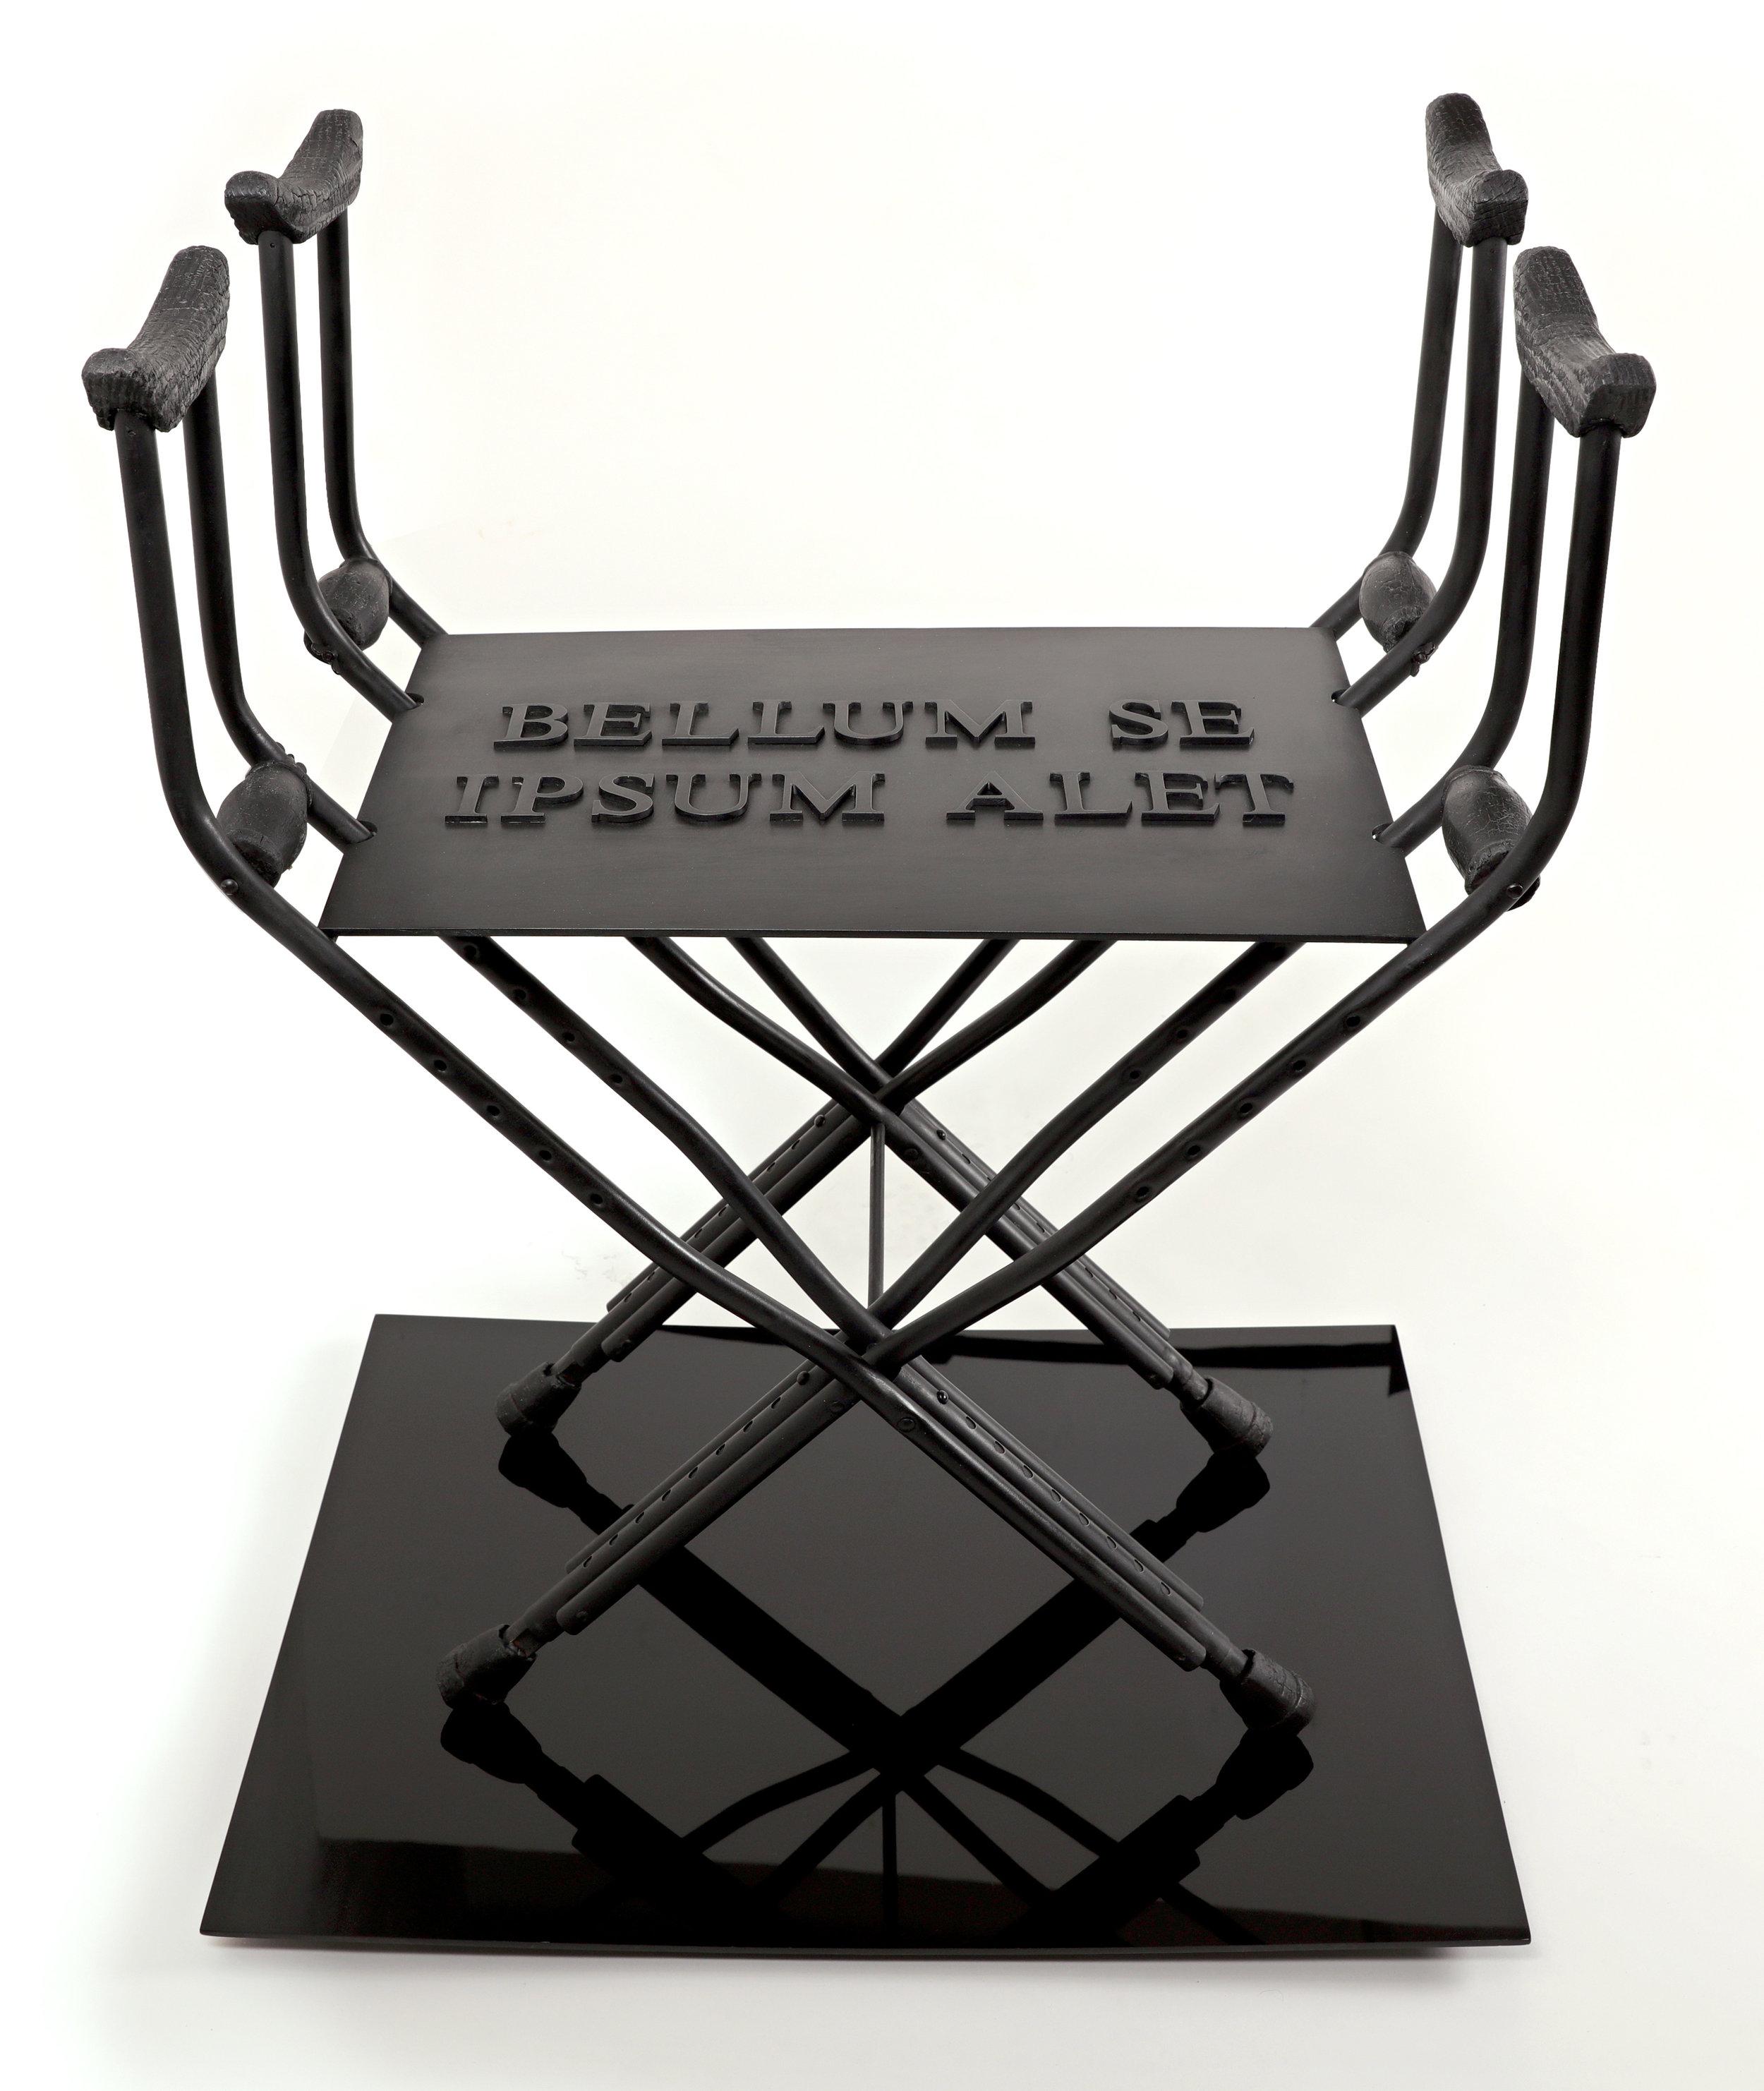 Sella Castrense Revisited , 2016 /Crutches, burned wood, aluminum, patina on black acrylic base /24 x 31 x 36 inches / Photo: Pedro Portal